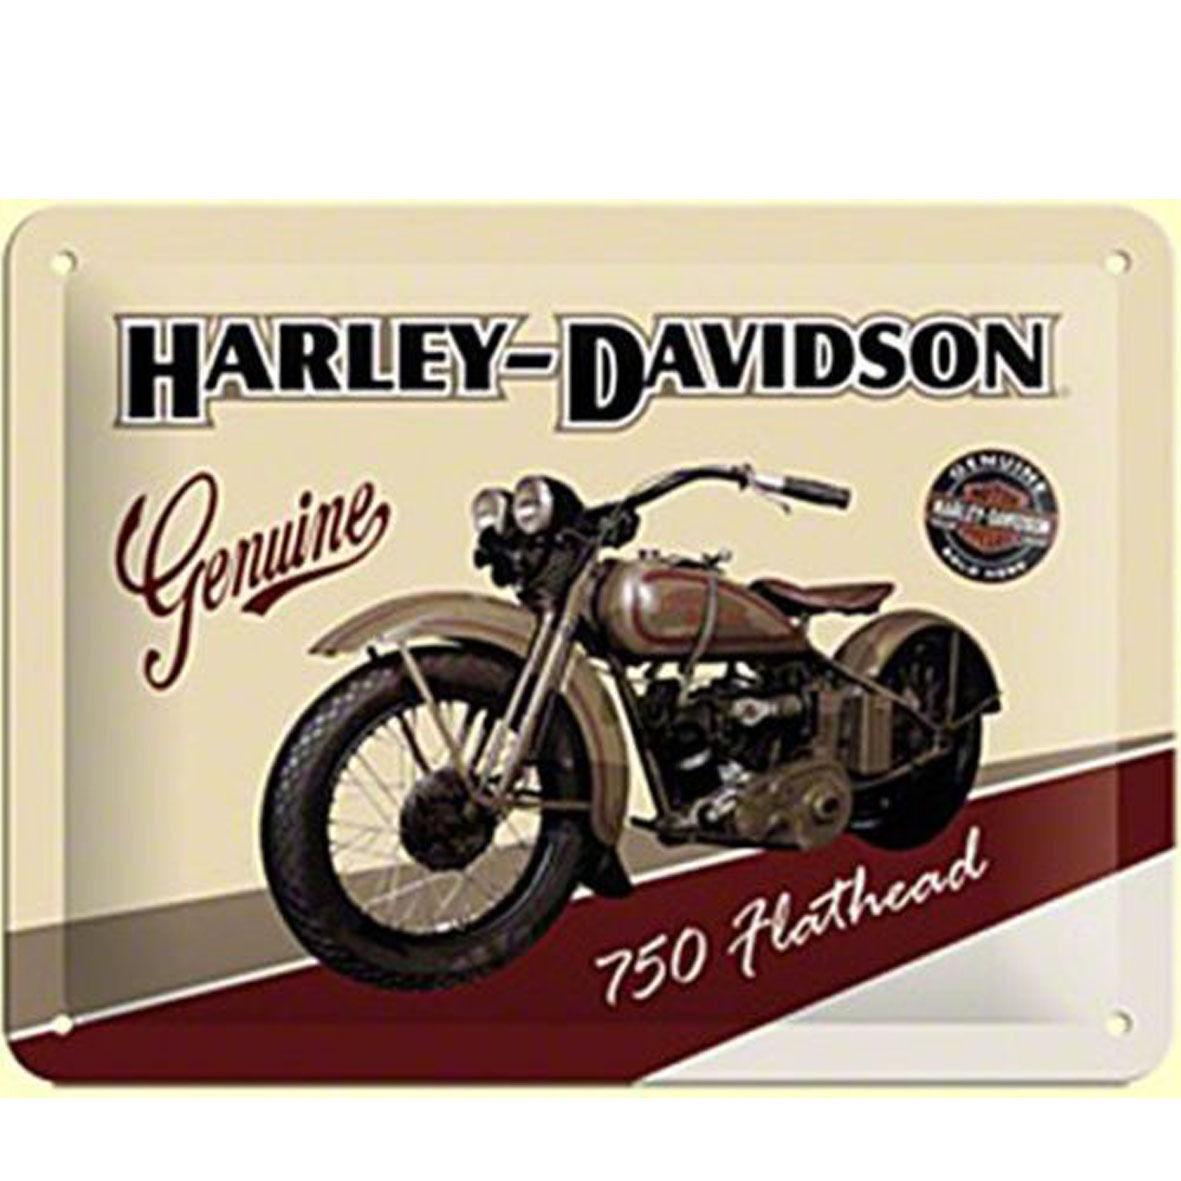 HARLEY DAVIDSON cartolina metal card in latta moto color beige 10x14cm ufficia